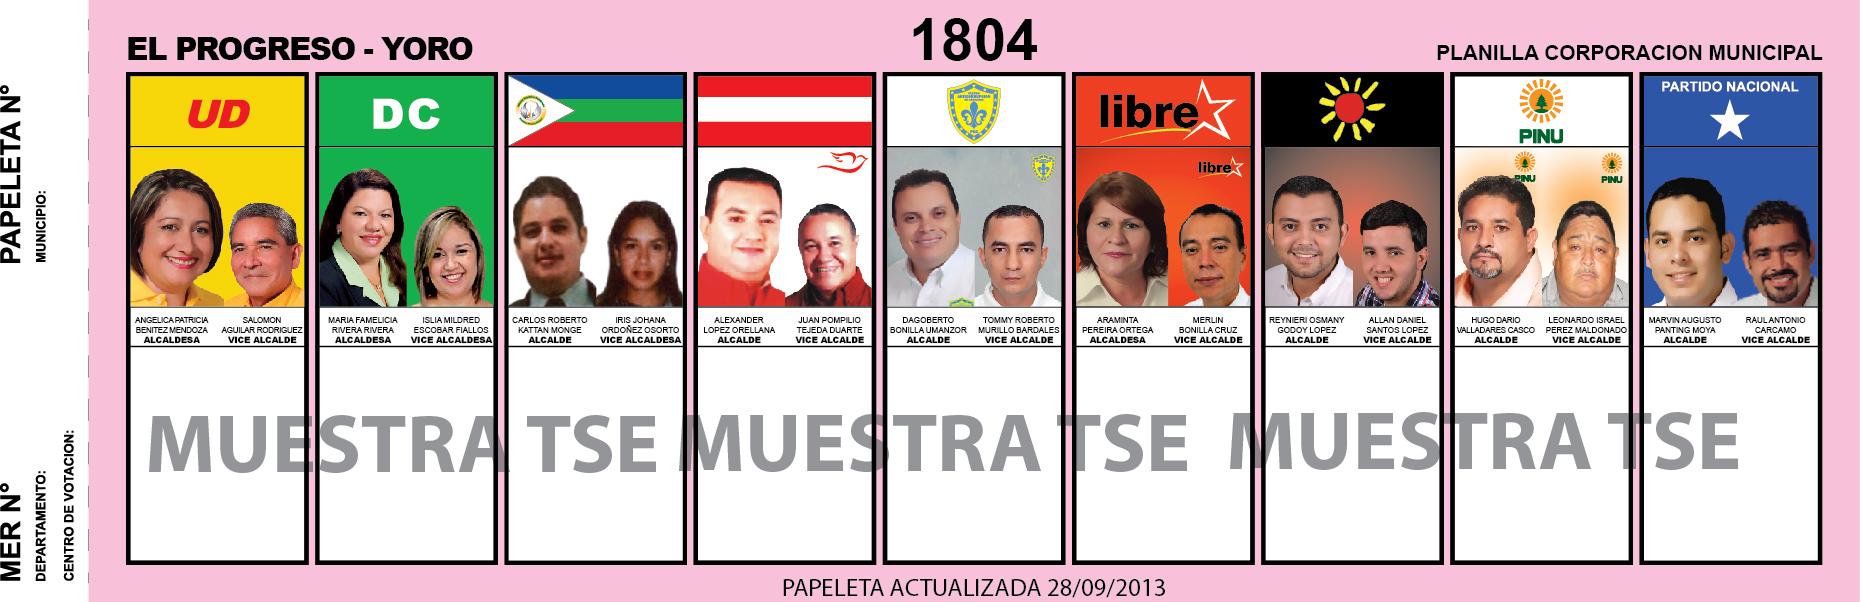 CANDIDATOS 2013 MUNICIPIO EL PROGRESO - YORO - HONDURAS